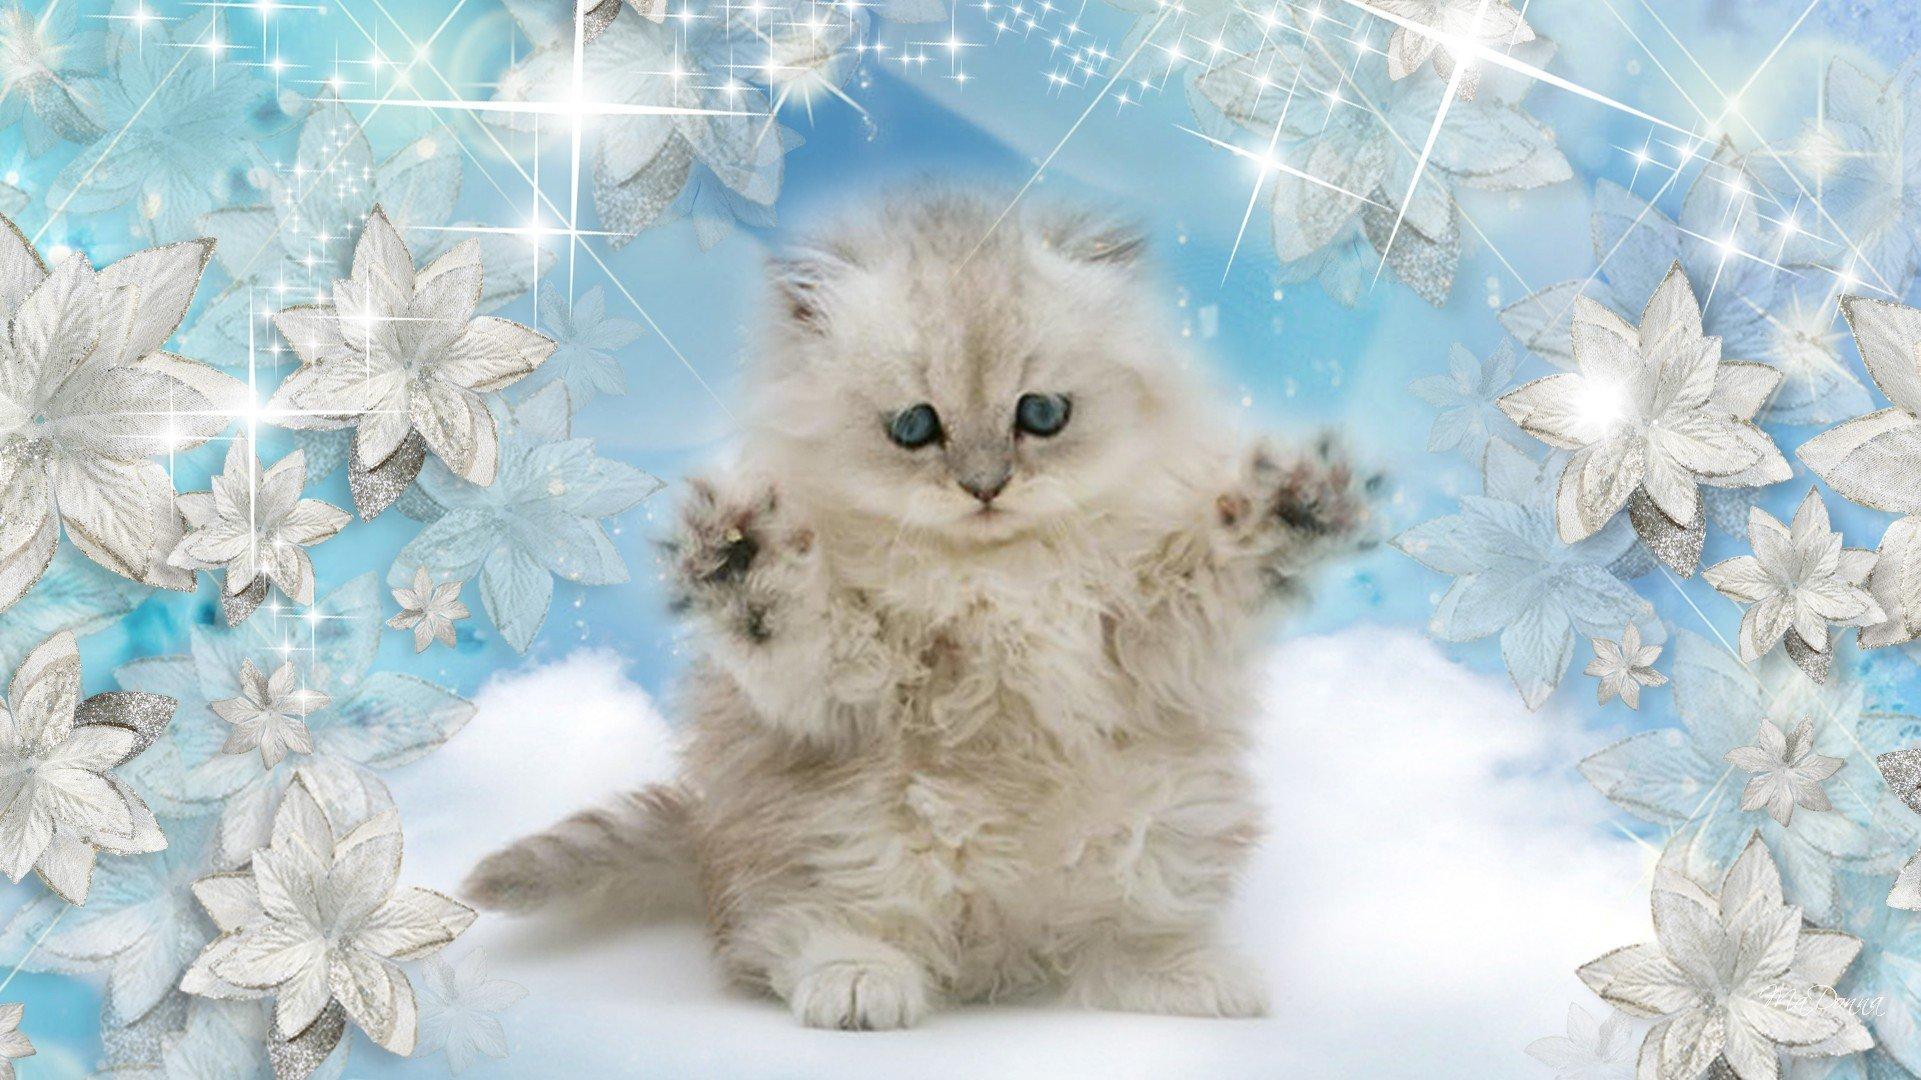 Winter snow nature landscape baby cat kitten wallpaper - Kitten wallpaper ...